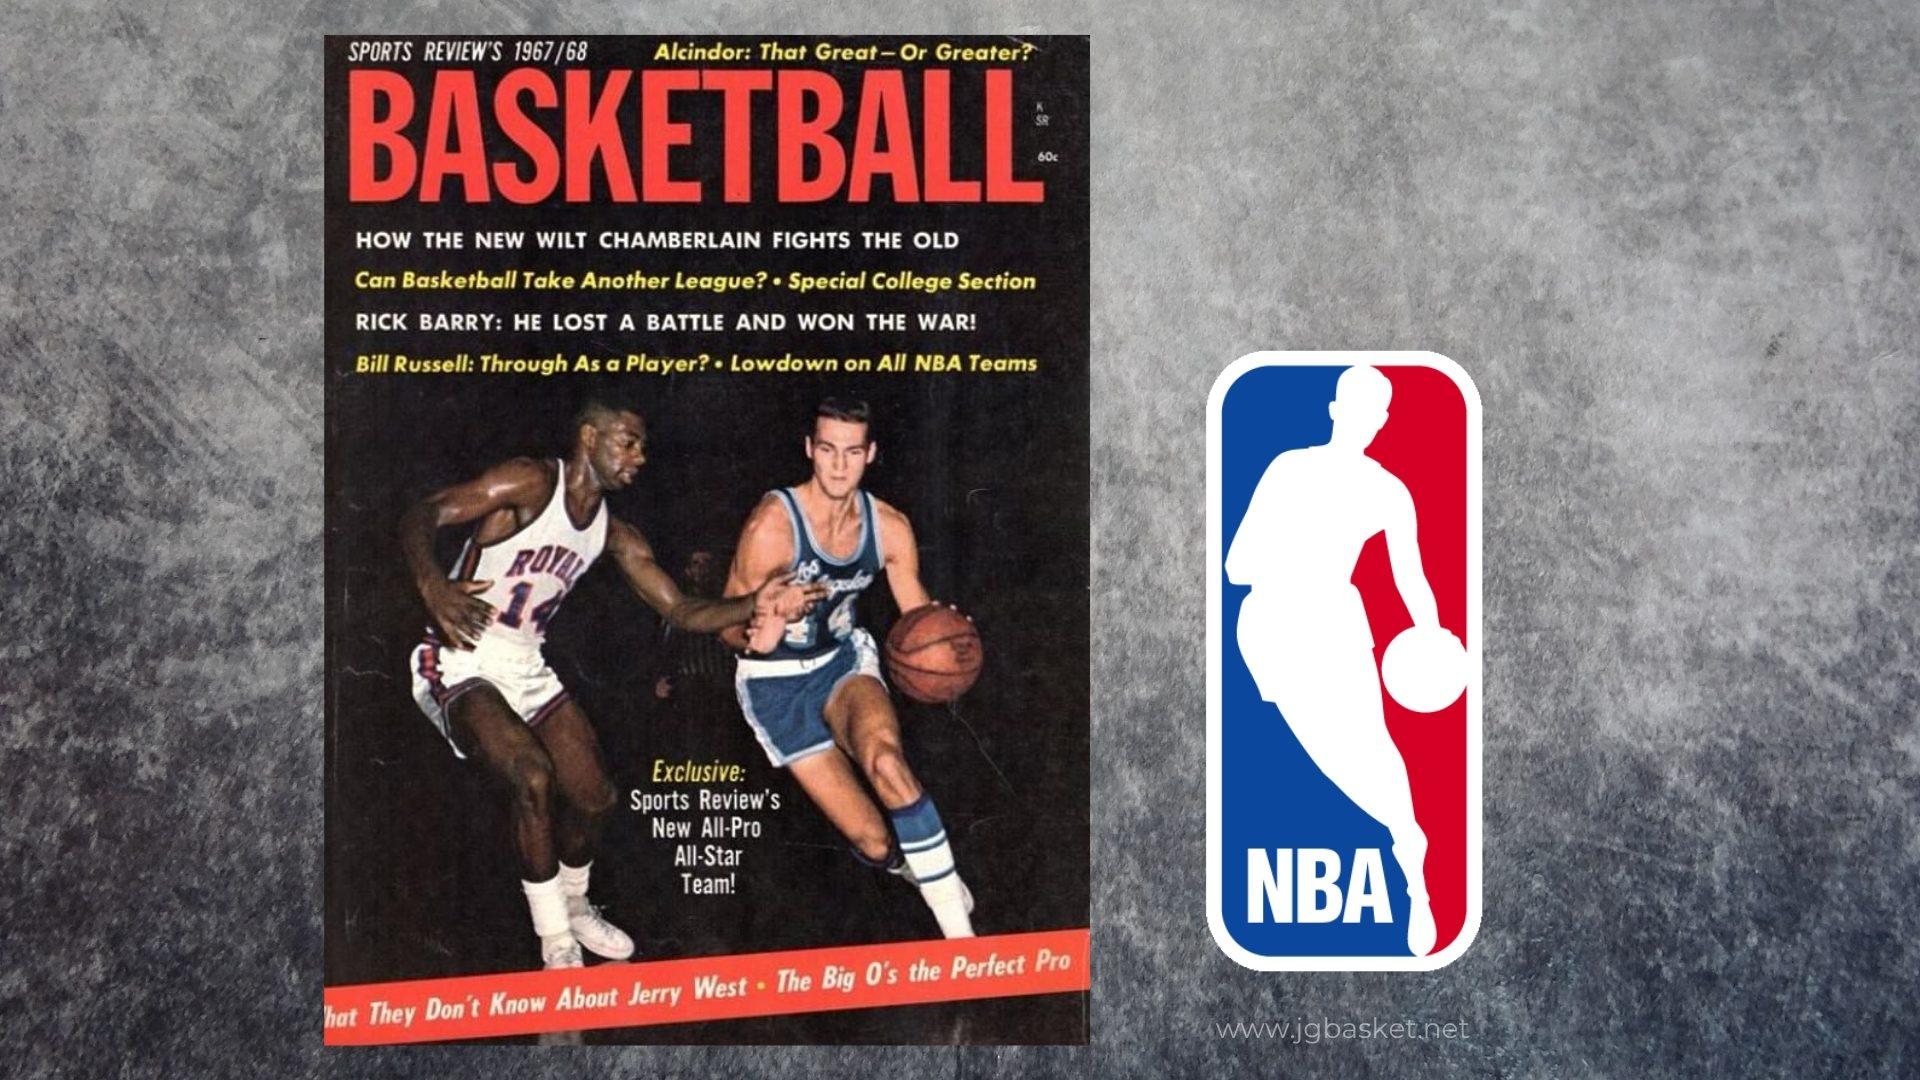 Sports Review Basketball 1967/68, Foto Jugador Jerry West. Logo NBA